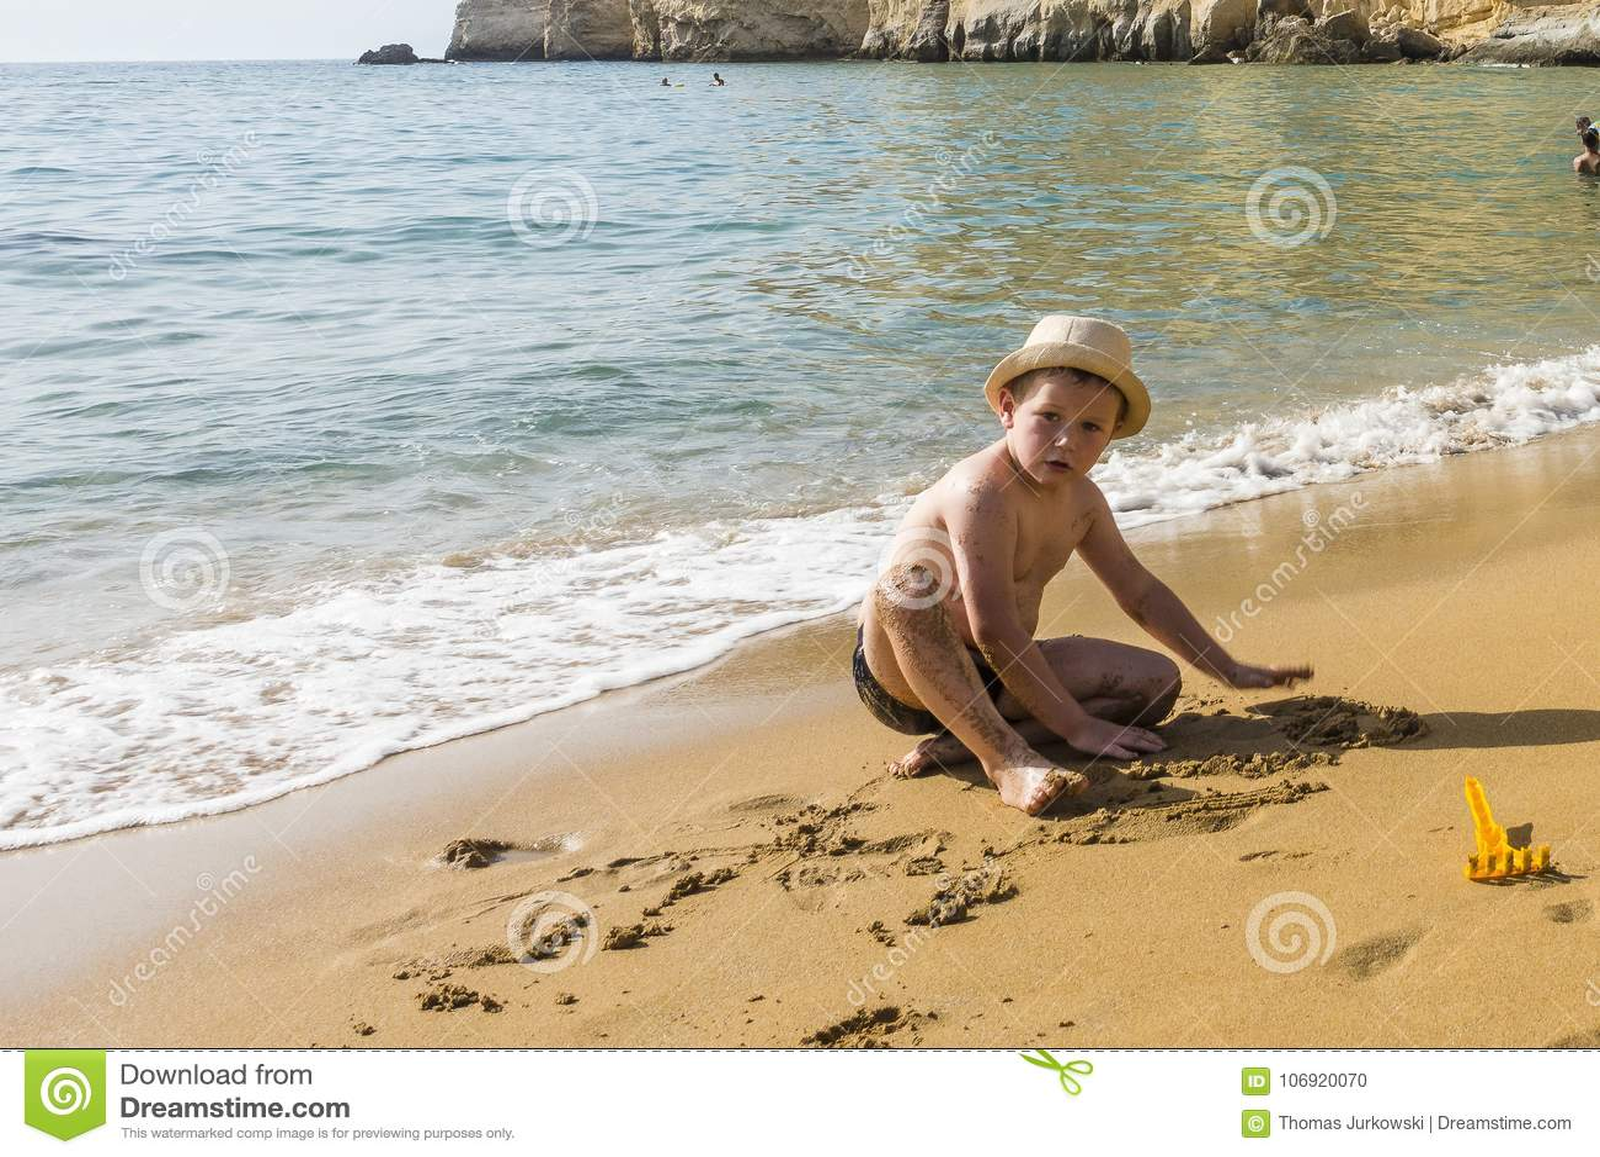 Young boy nudists beach